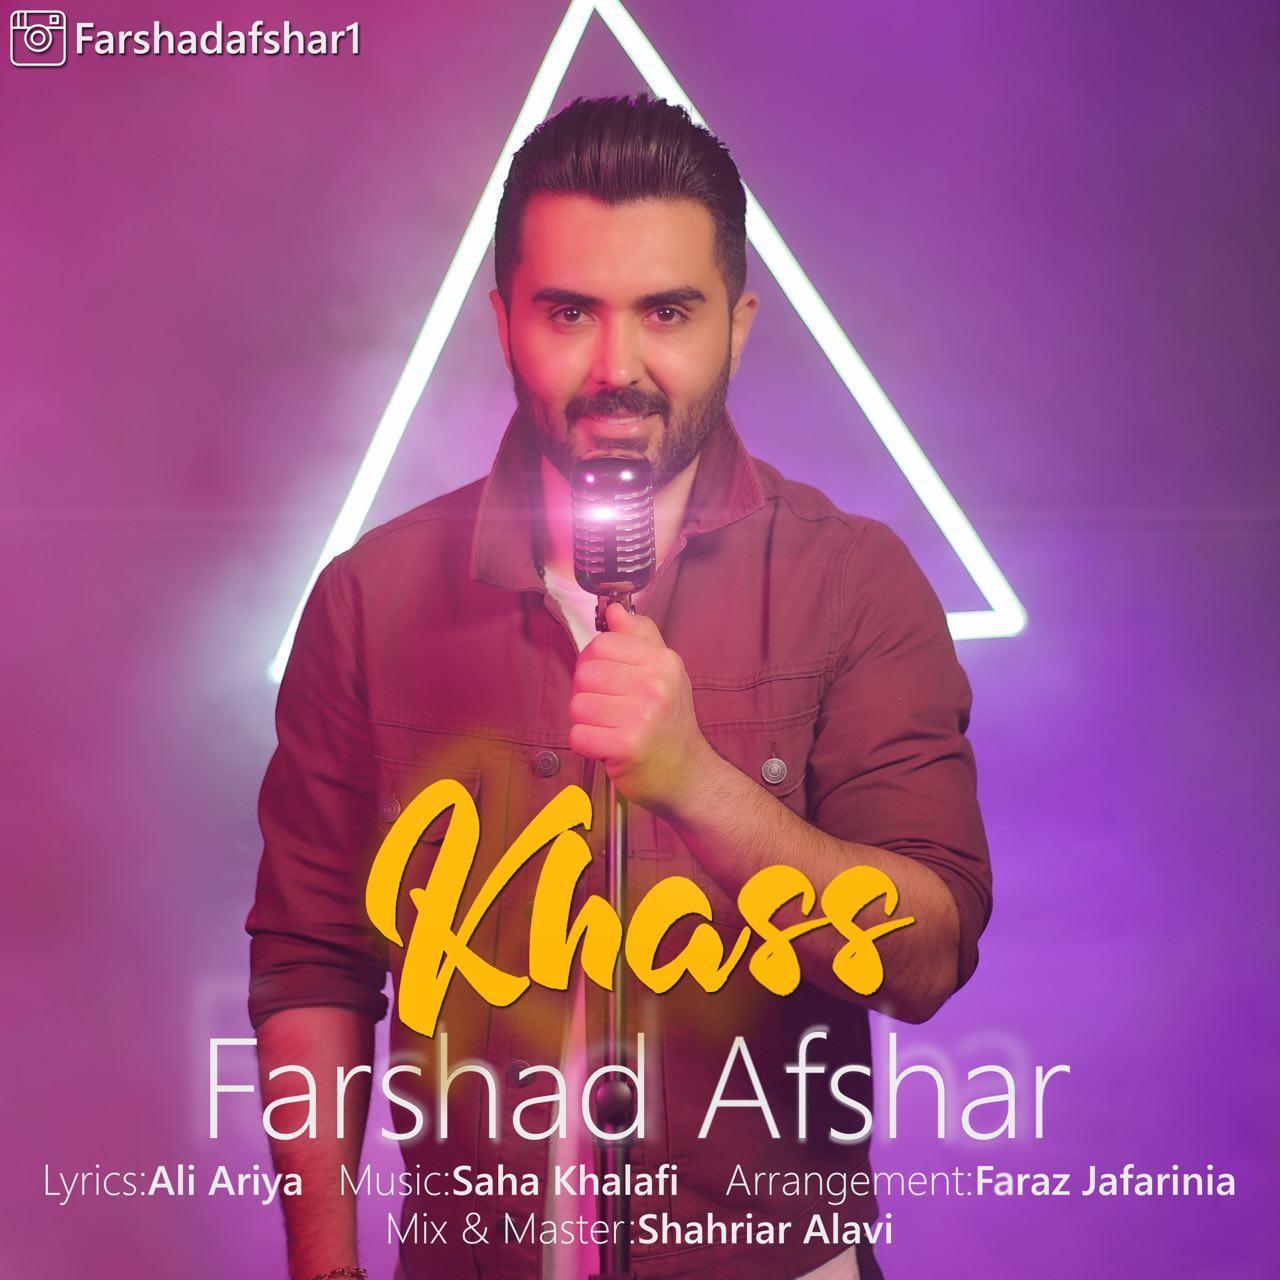 Farshad Afshar – Khass